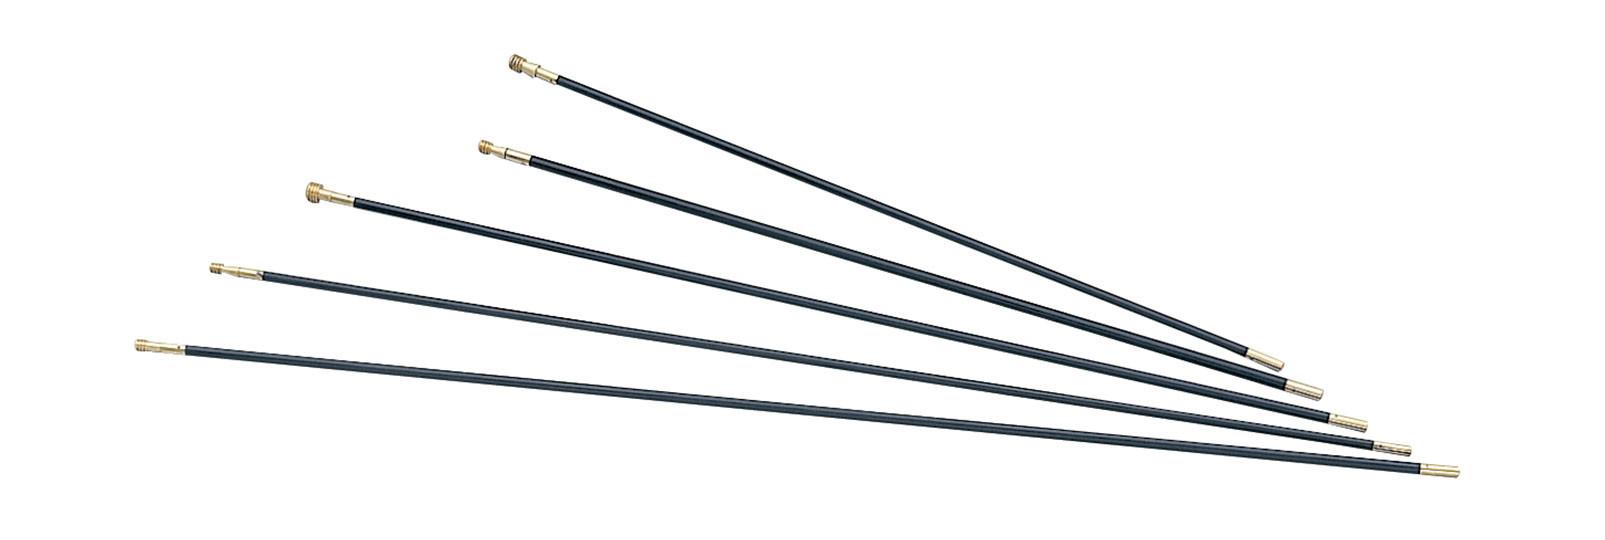 Bacchetta in fibra per armi avancarica 9x980 mm